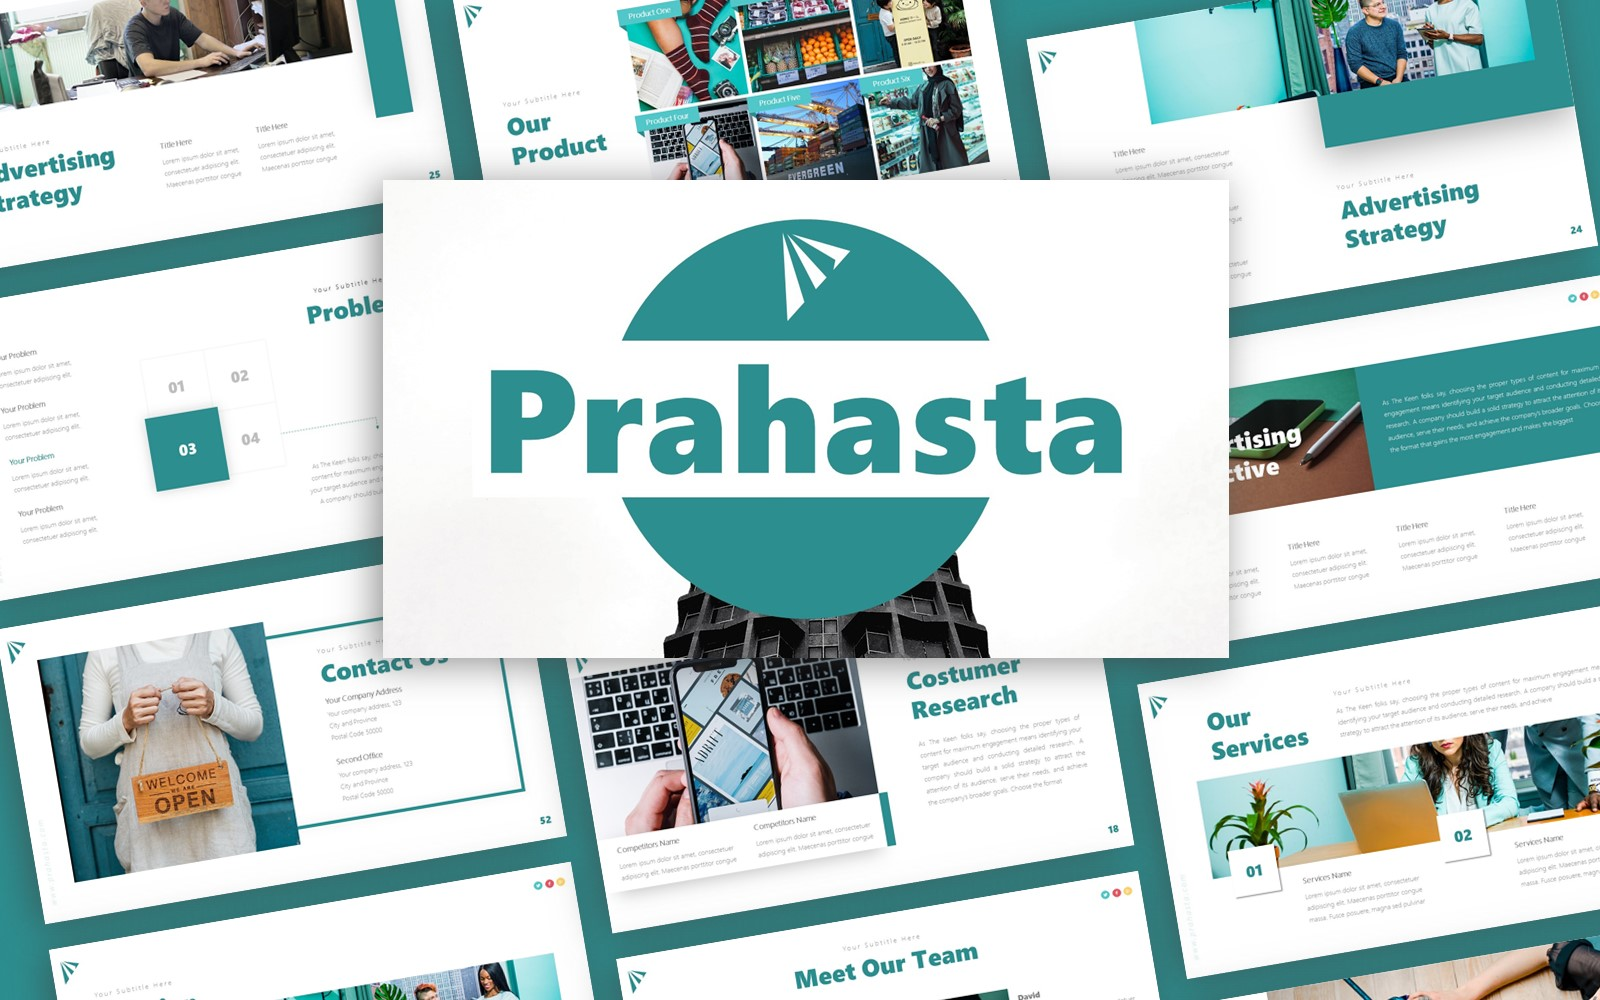 Prahasta Advertising Presentation PowerPoint Template